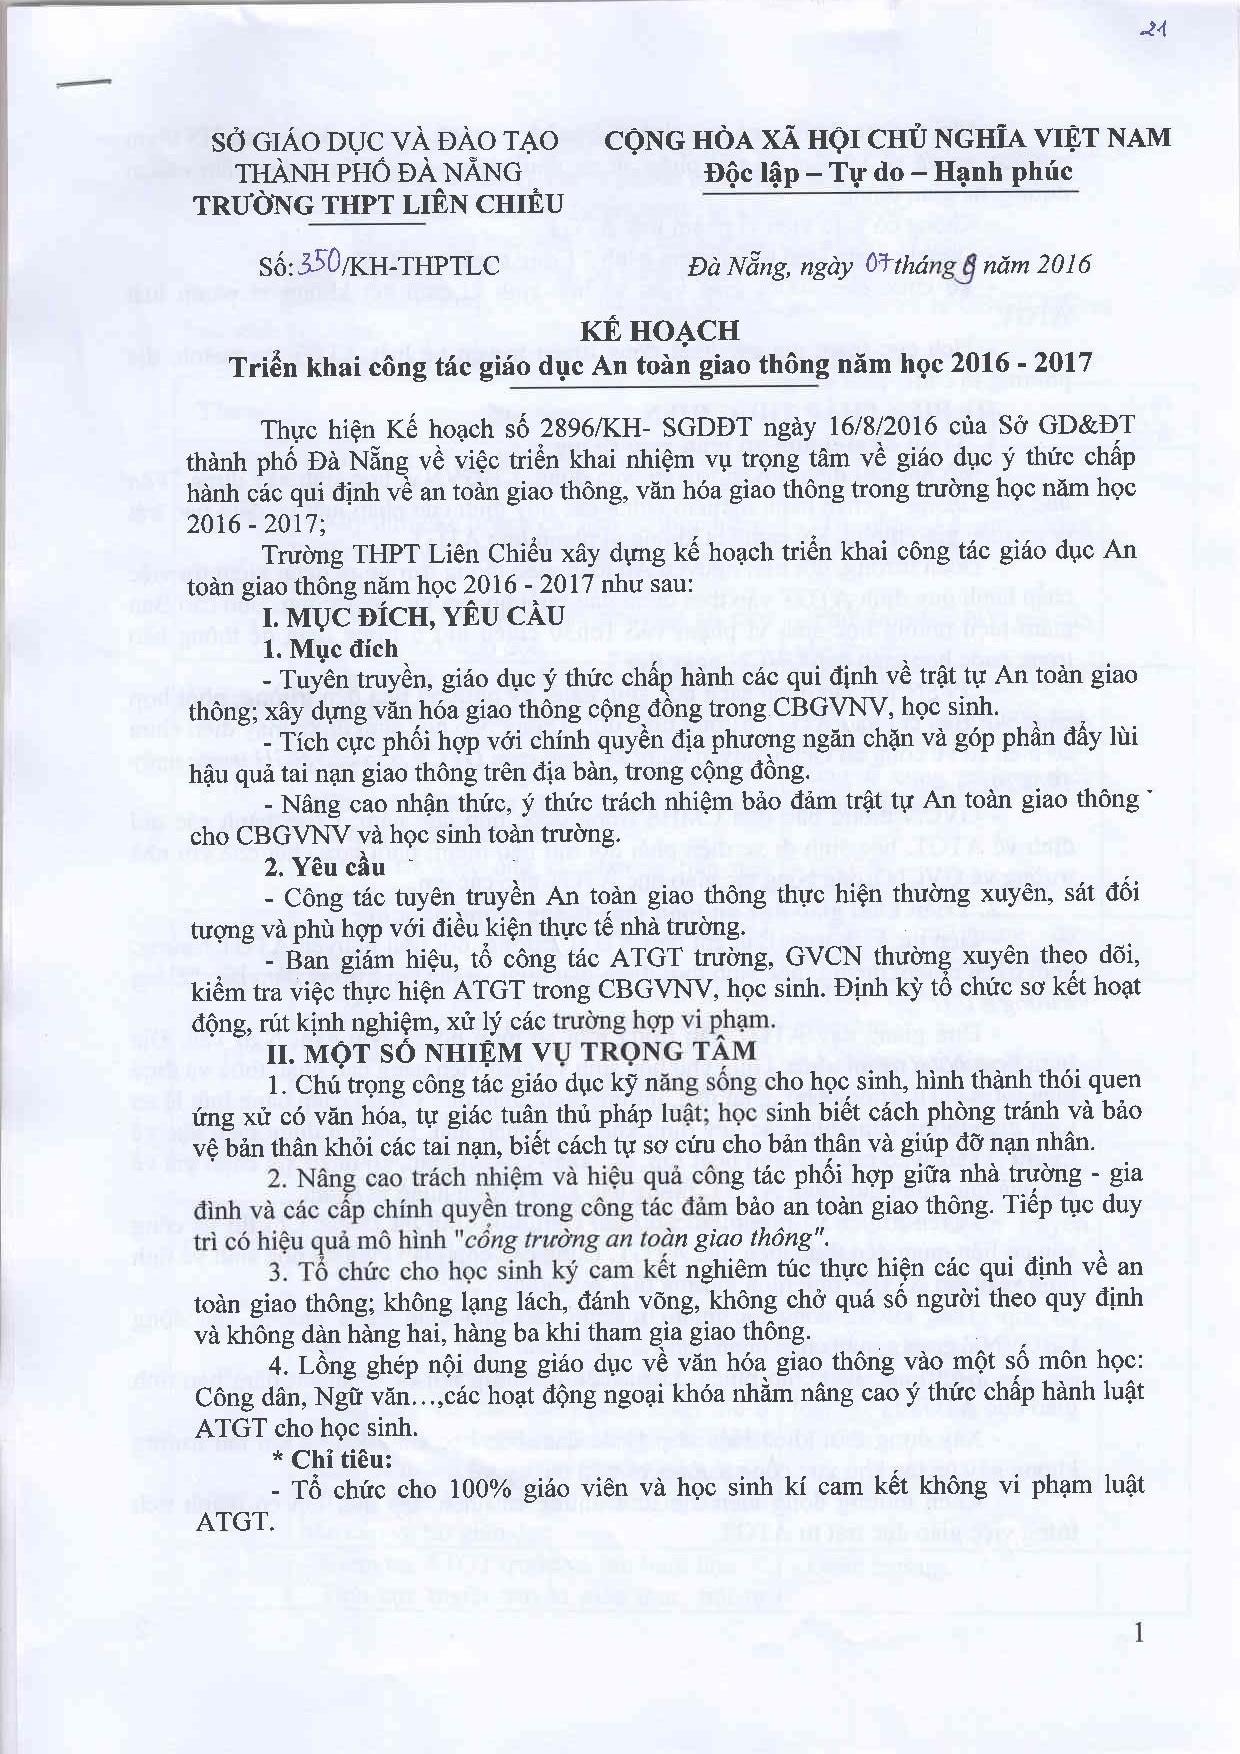 ke-hoach-trien-khai-cong-tac-giao-duc-atgt-nam-hoc-2016-2017-page-001